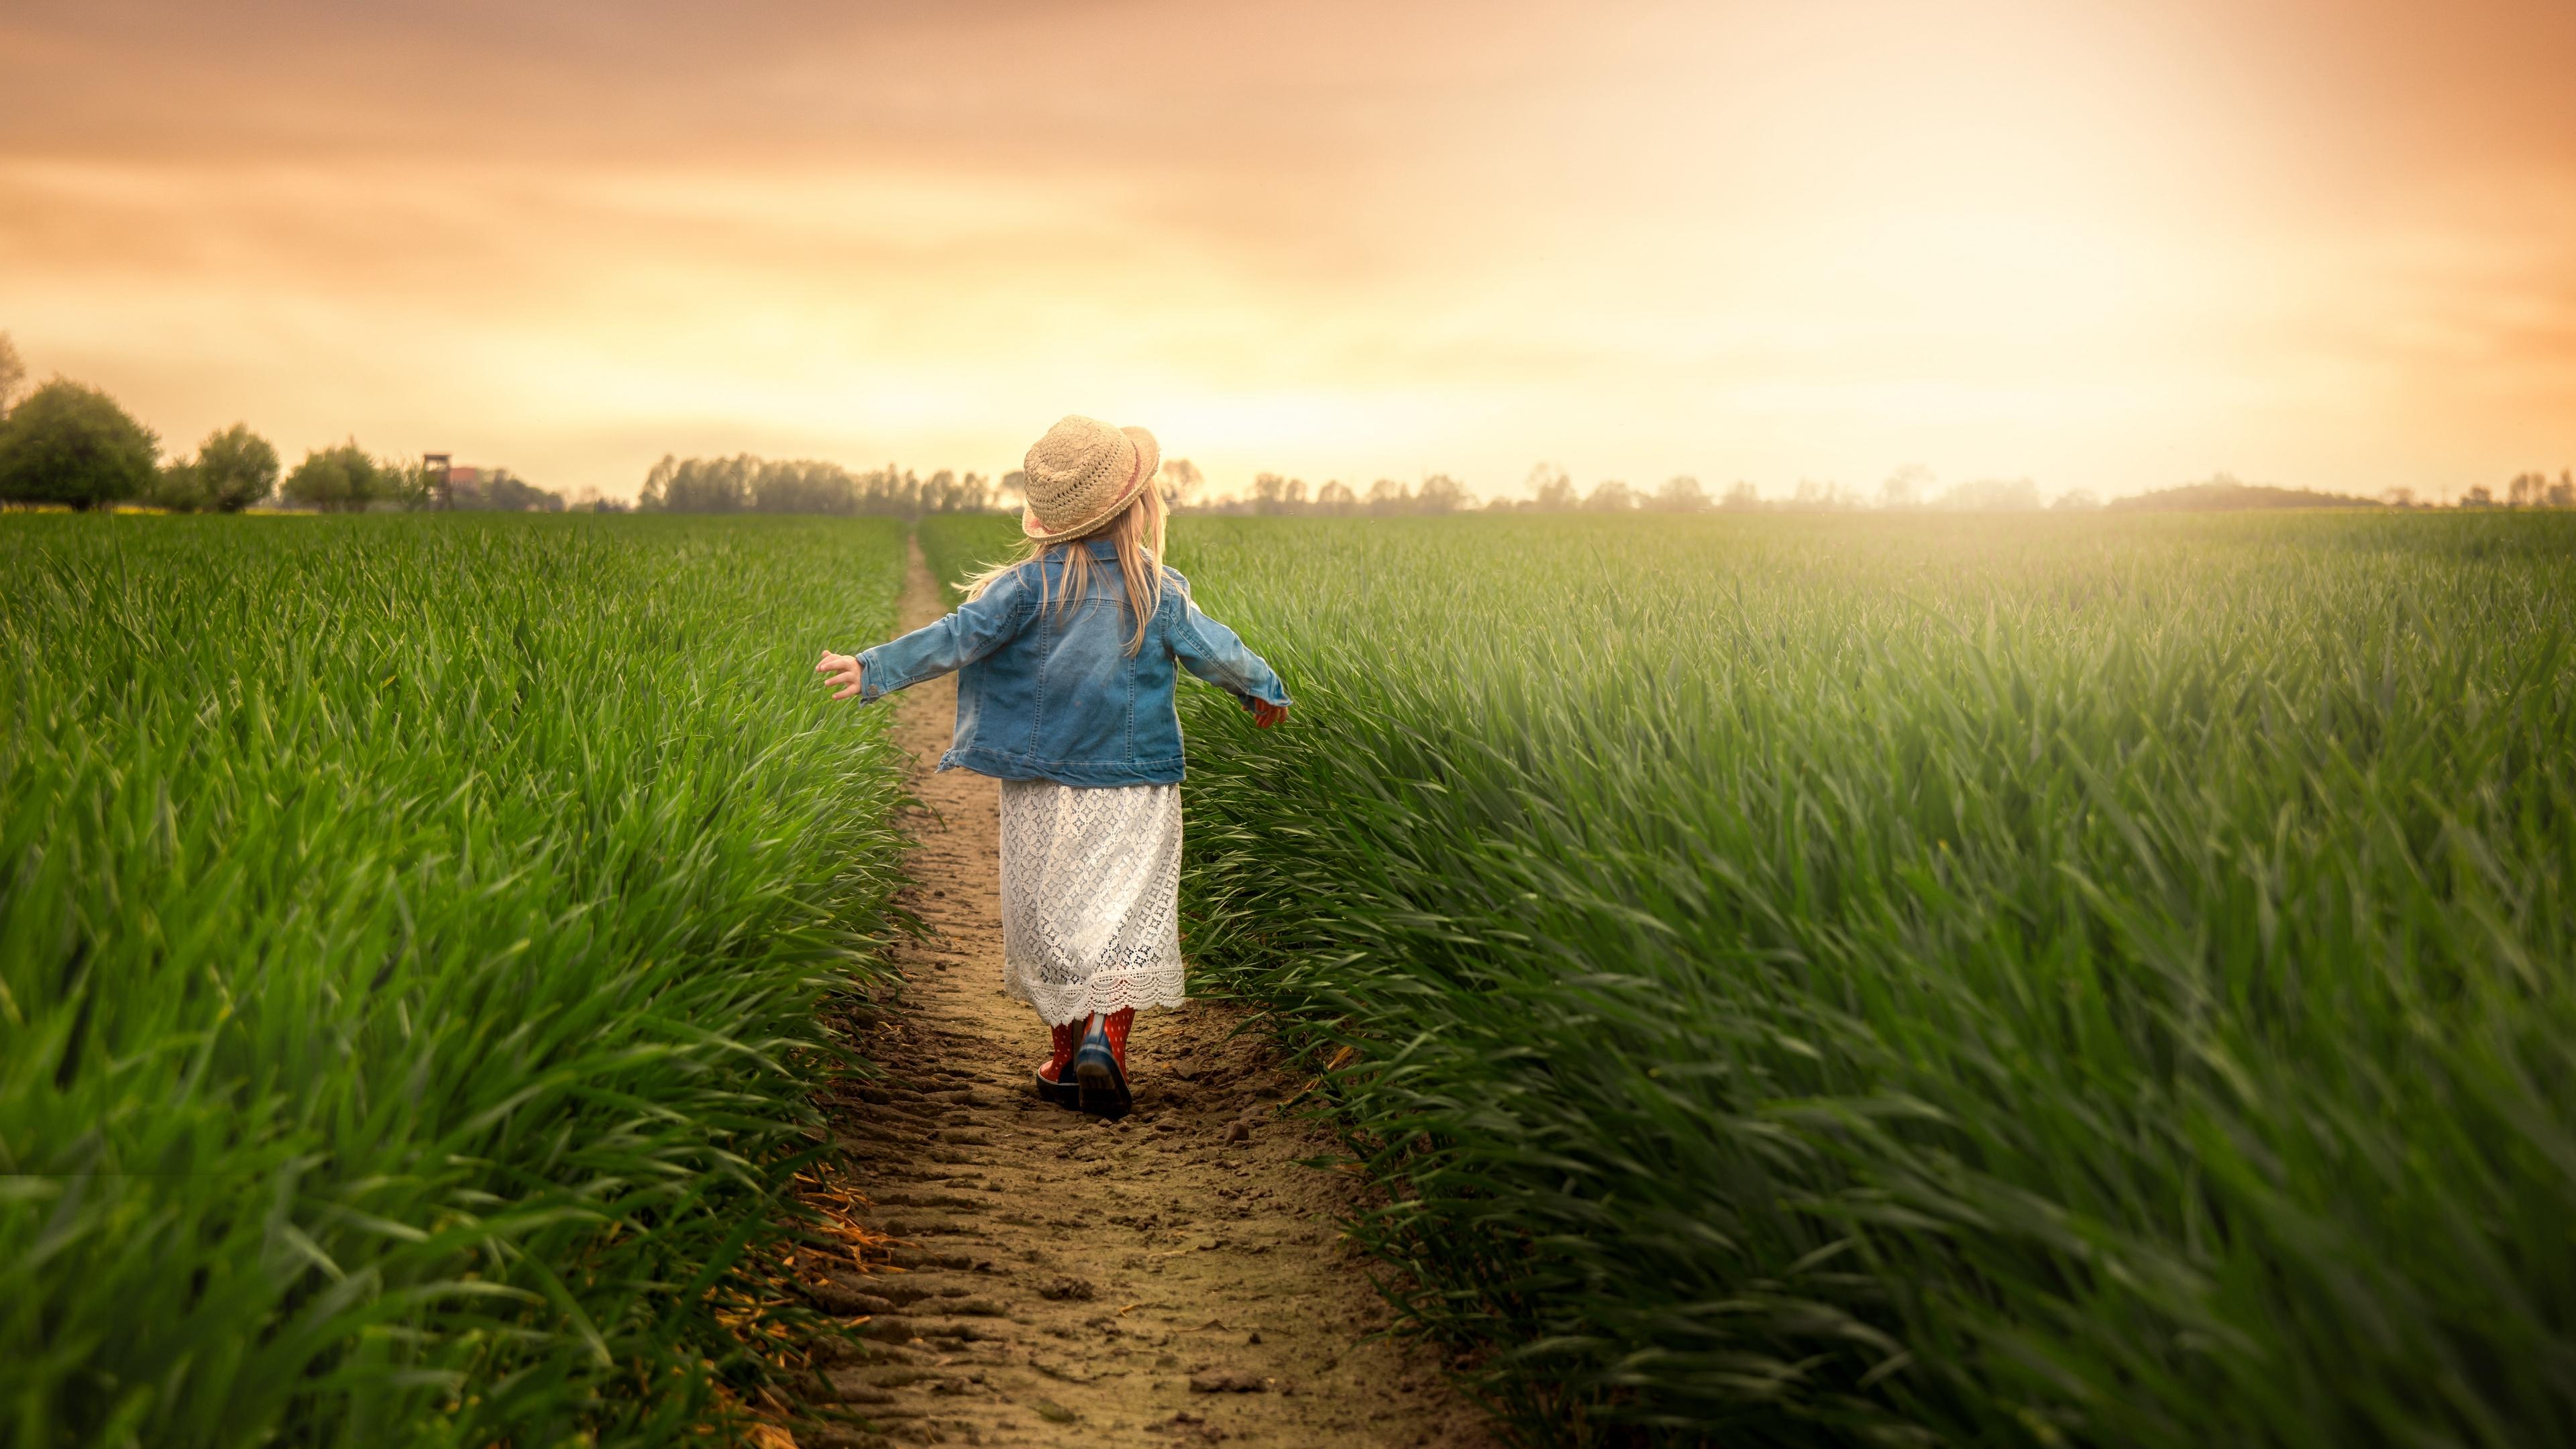 child field grass path walk 4k 1541116650 - child, field, grass, path, walk 4k - Grass, Field, child